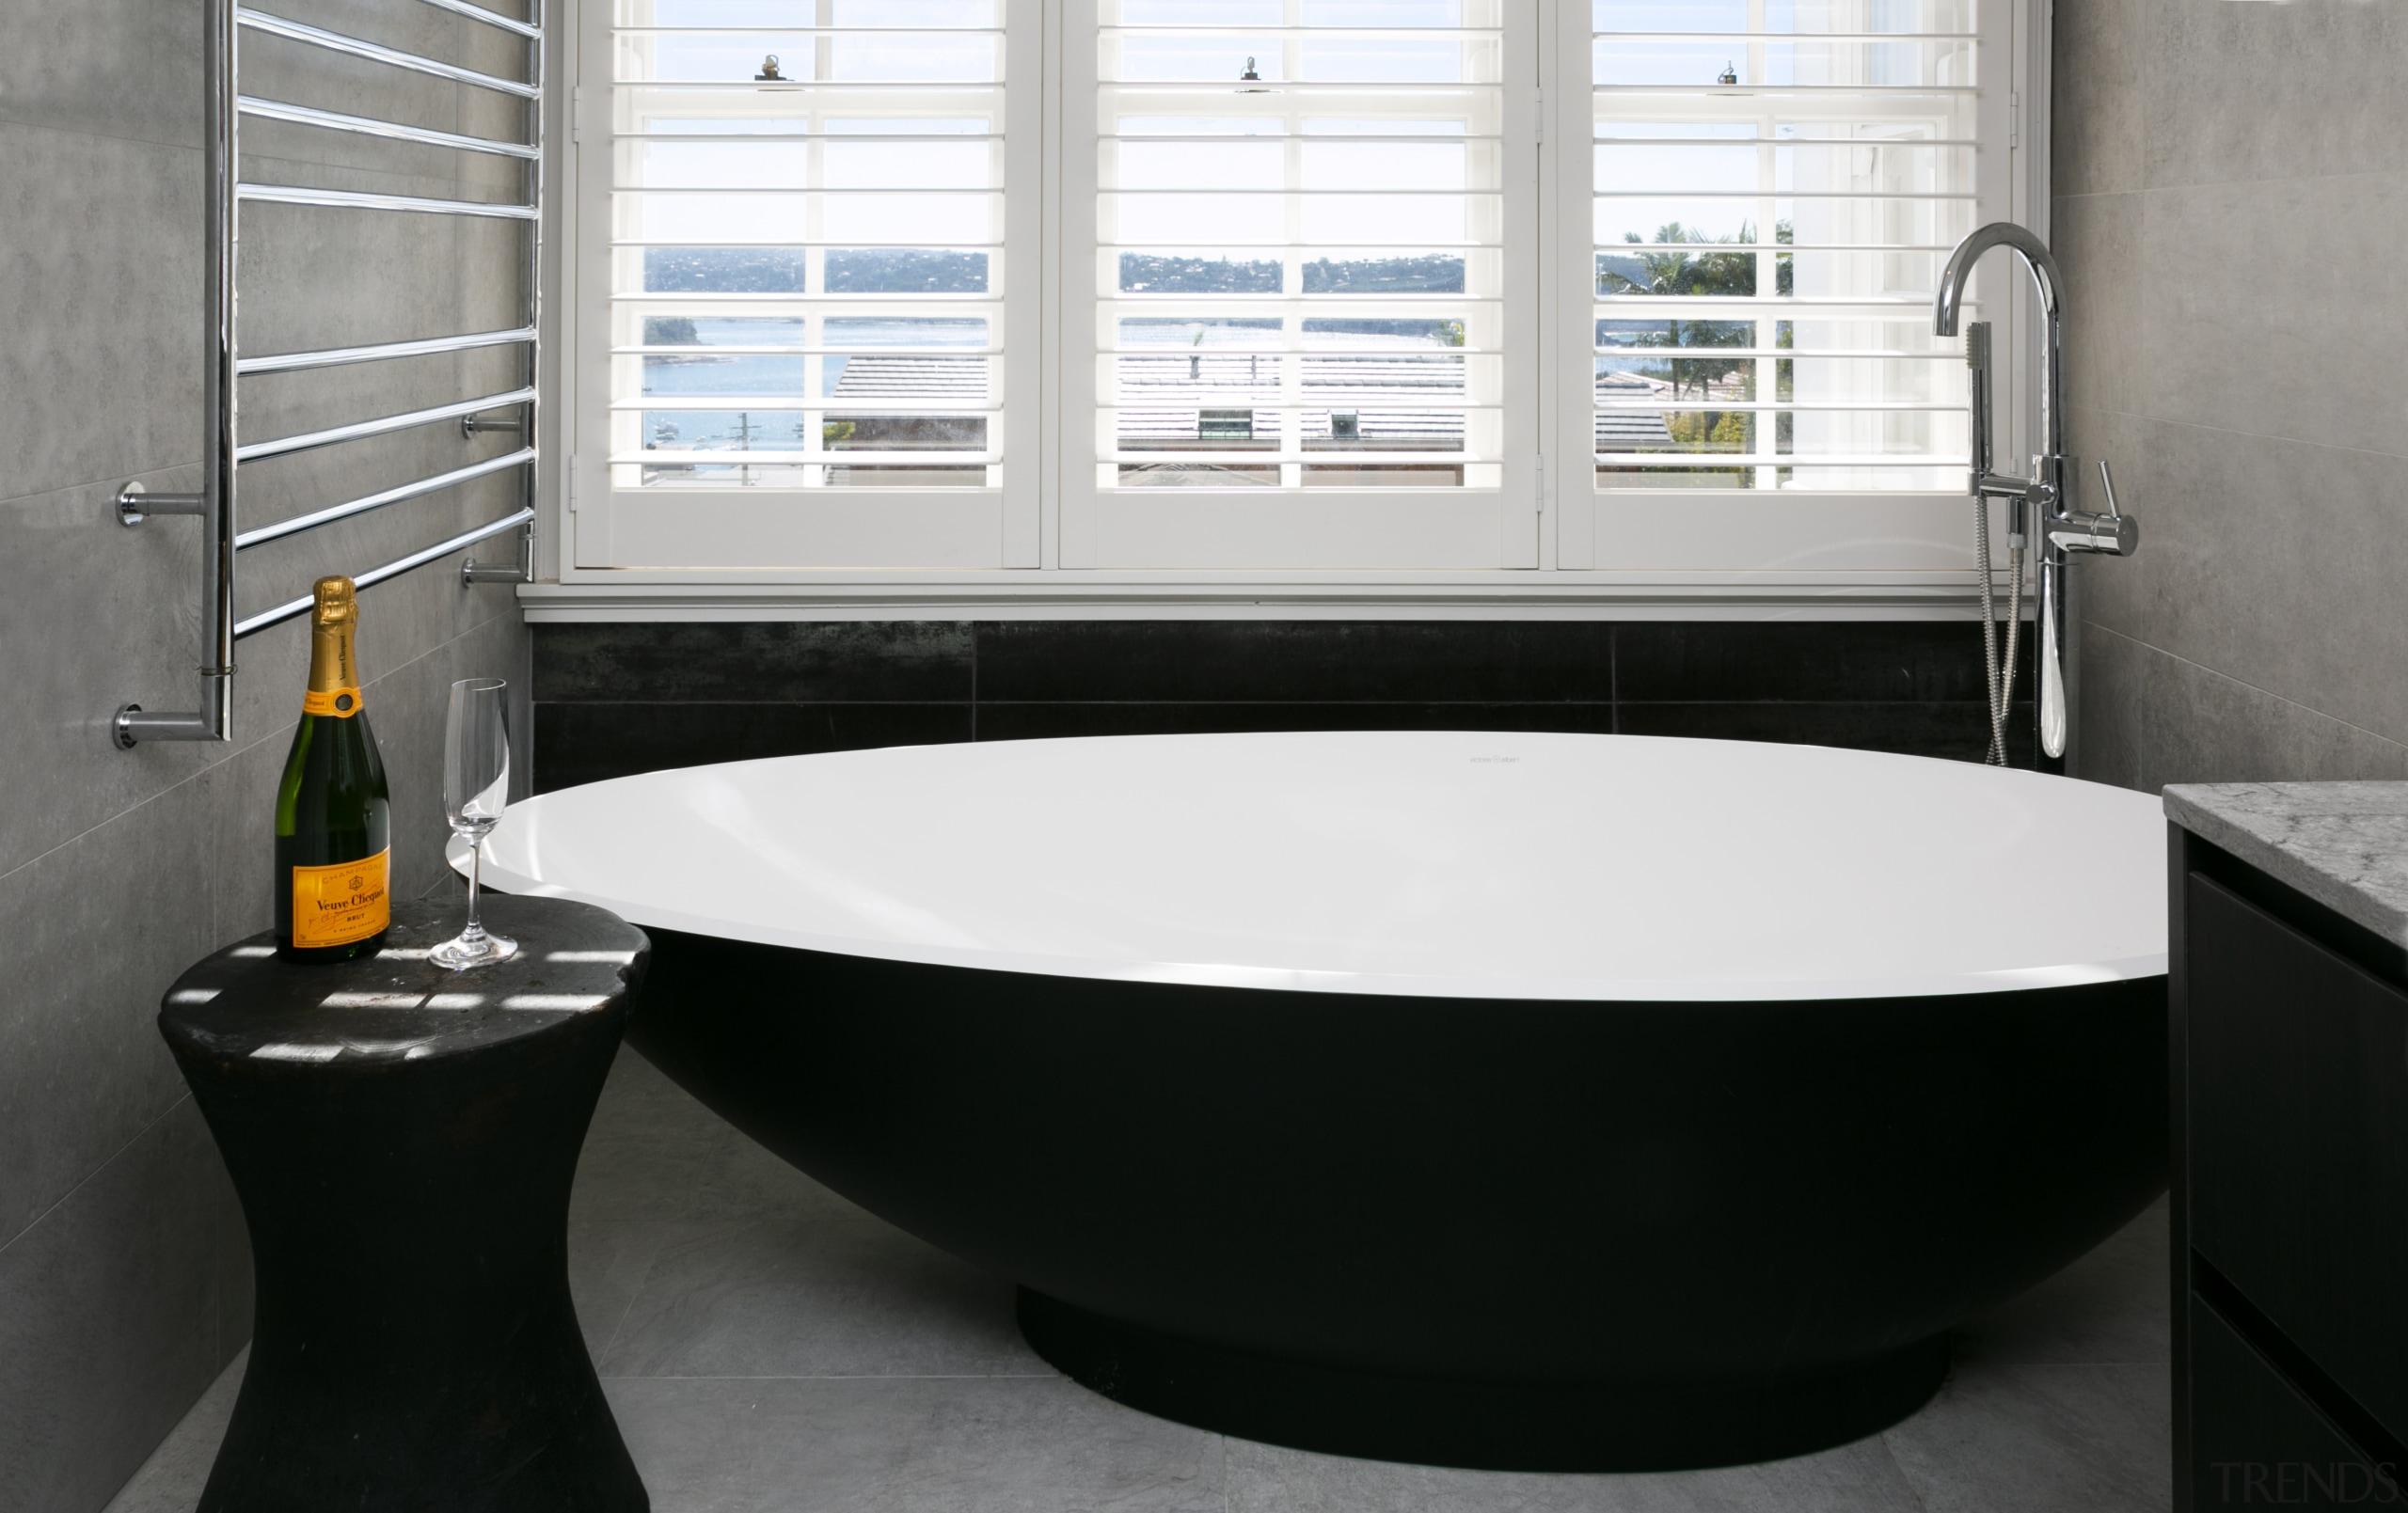 Pride of place – for this master ensuite architecture, bathroom, bathroom sink, bathtub, black, floor, flooring, home, interior design, jacuzzi, material property, plumbing fixture, property, room, sink, tap, tile, black, white